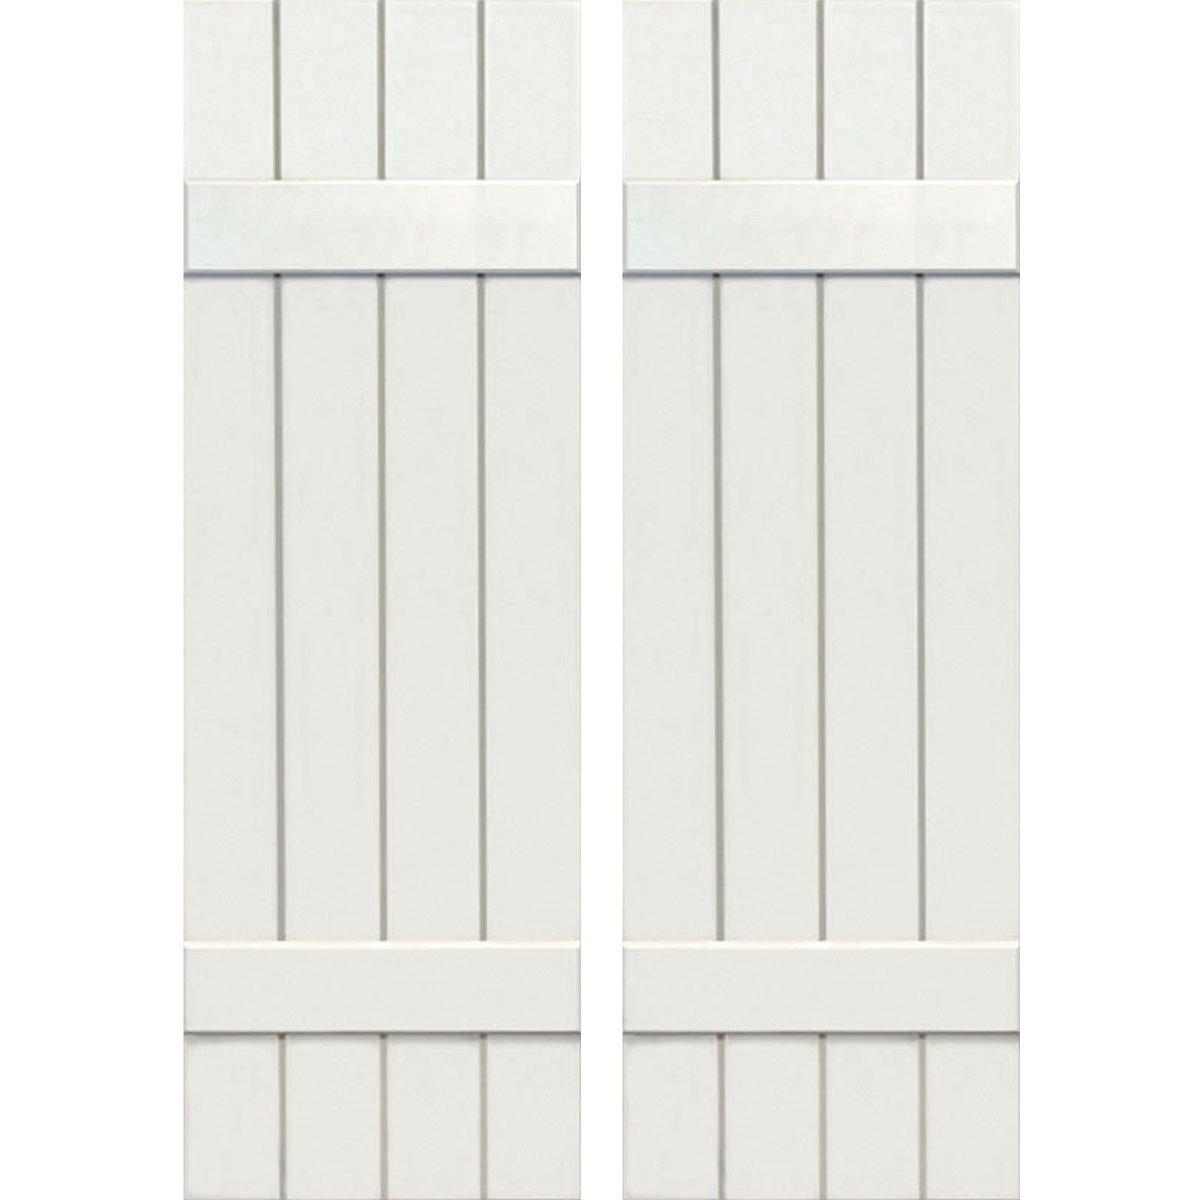 Ekena Millwork CWB15X025WHC Exterior Four Board